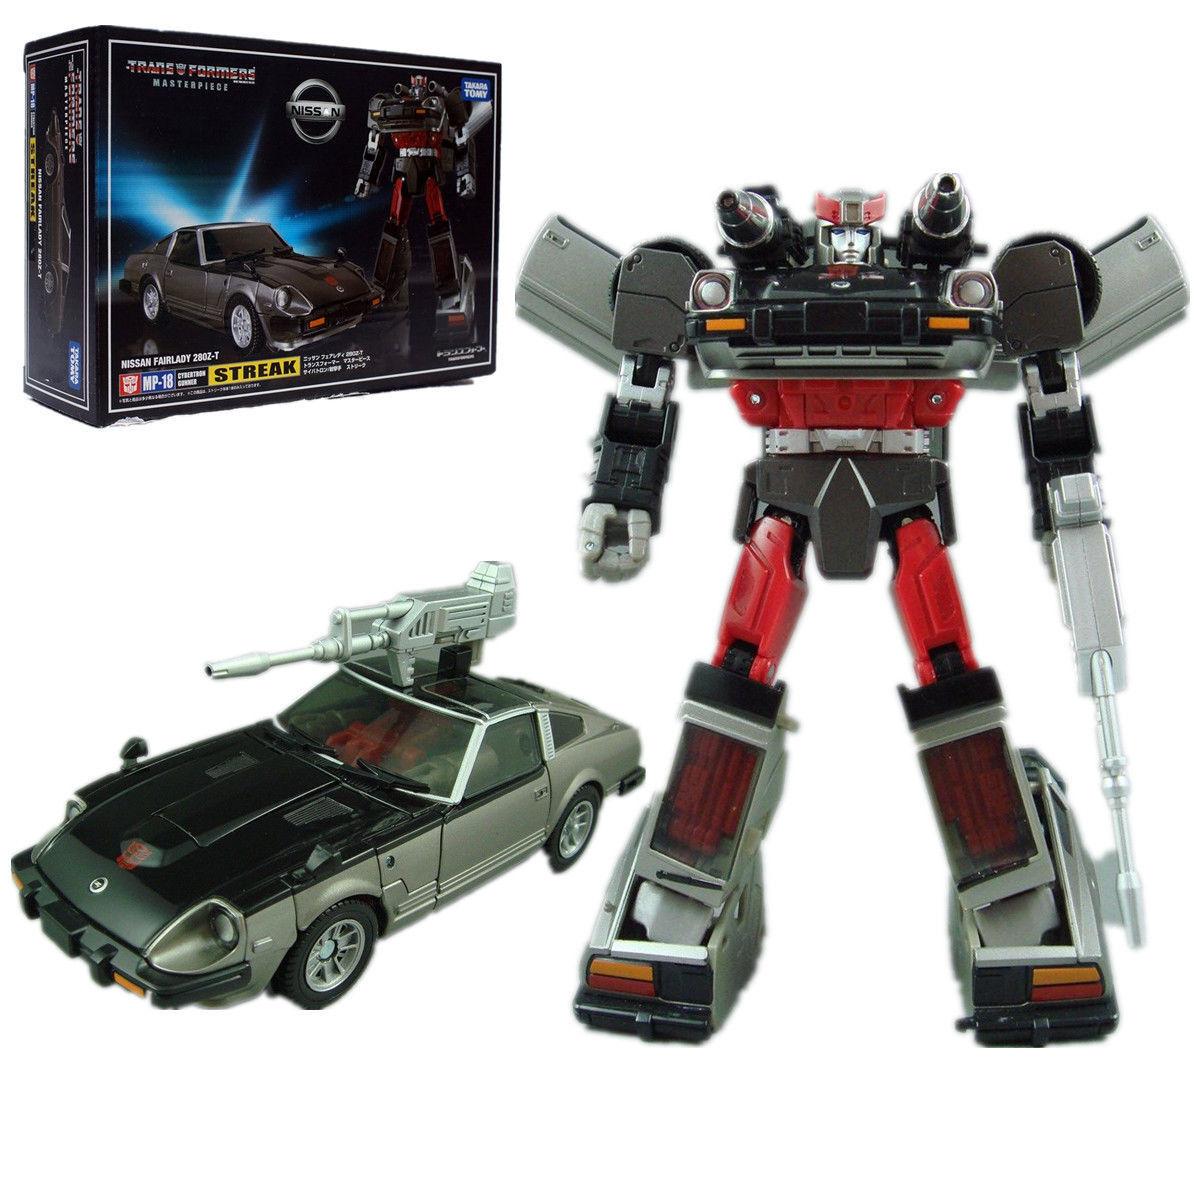 Transformers Masterpiece MP18 bluee Streak Nissan Fairlady Action Figures Car Toy